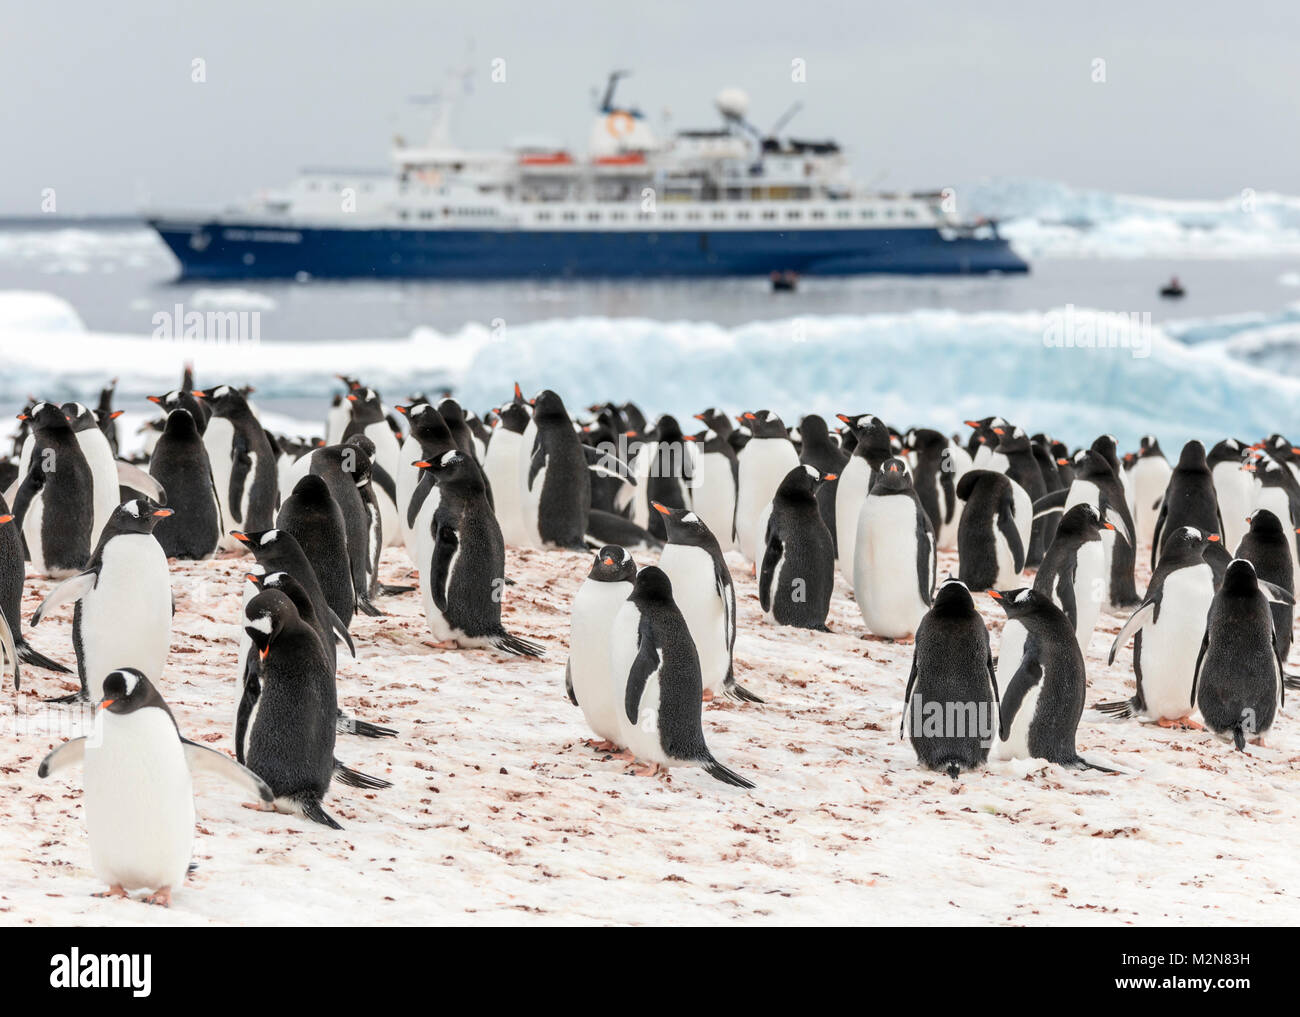 Long-tailed Gentoo penguins; Pygoscelis papua; Cuverville Island; Ocean Adventurer ship beyond; Antarctica - Stock Image